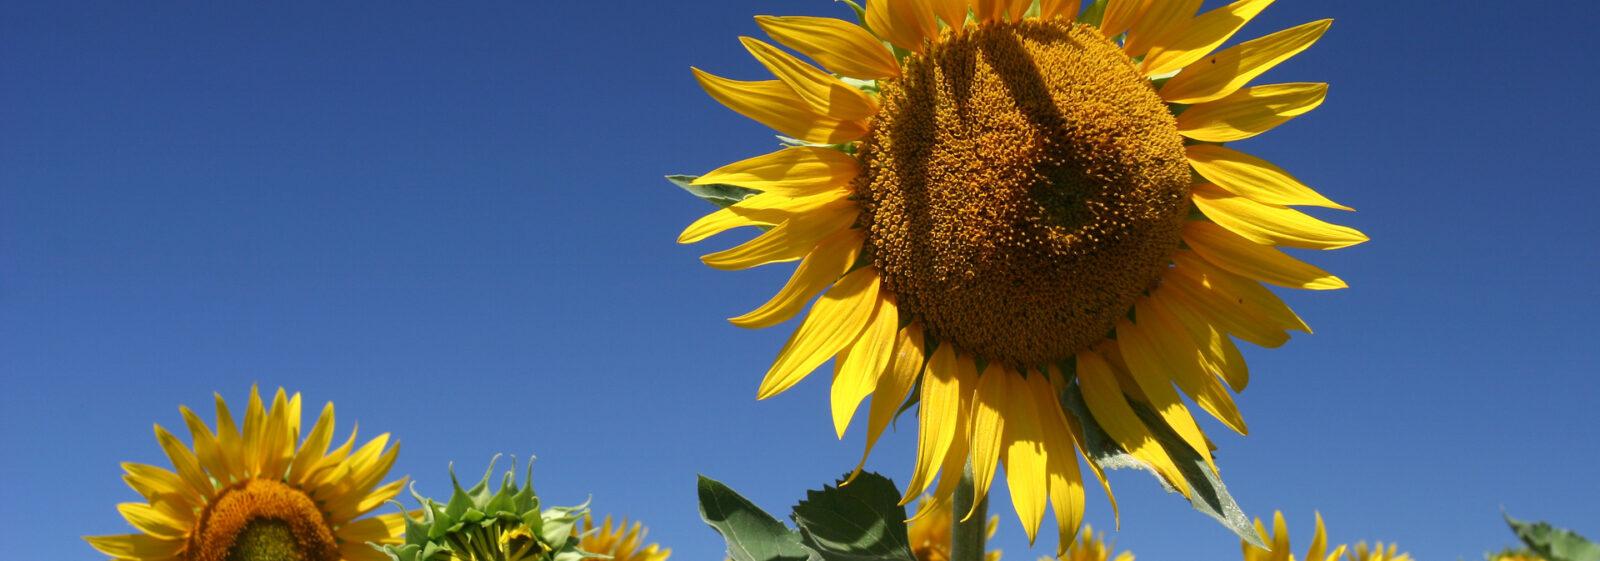 sunflowers-3-1393020-1920x1280